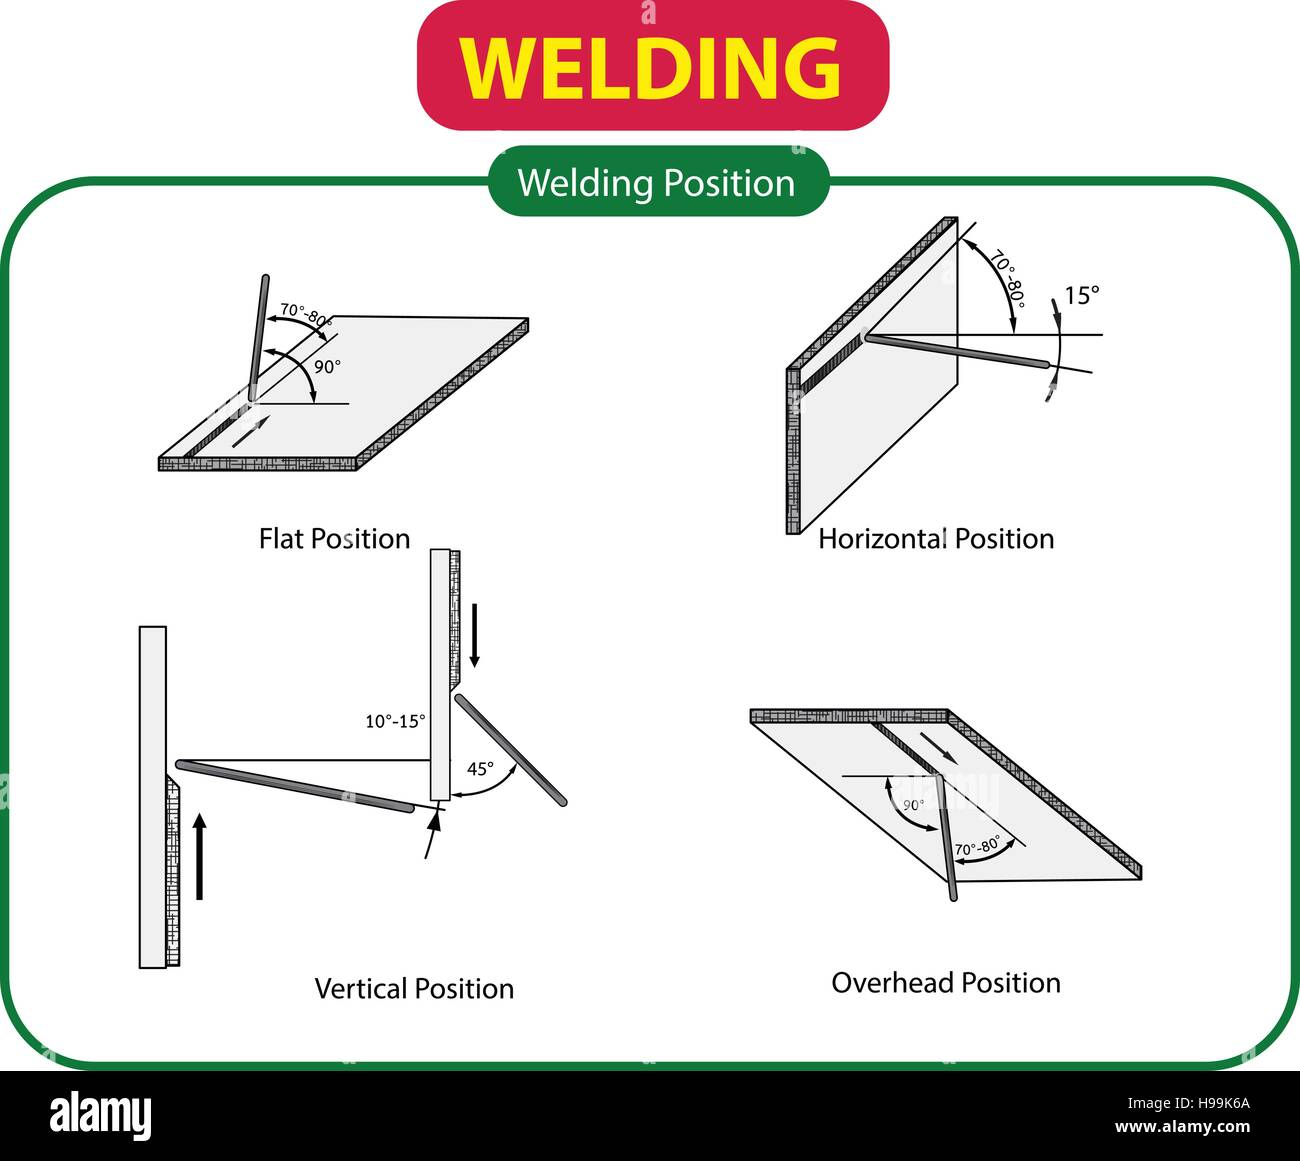 hight resolution of vector illustration of welding position